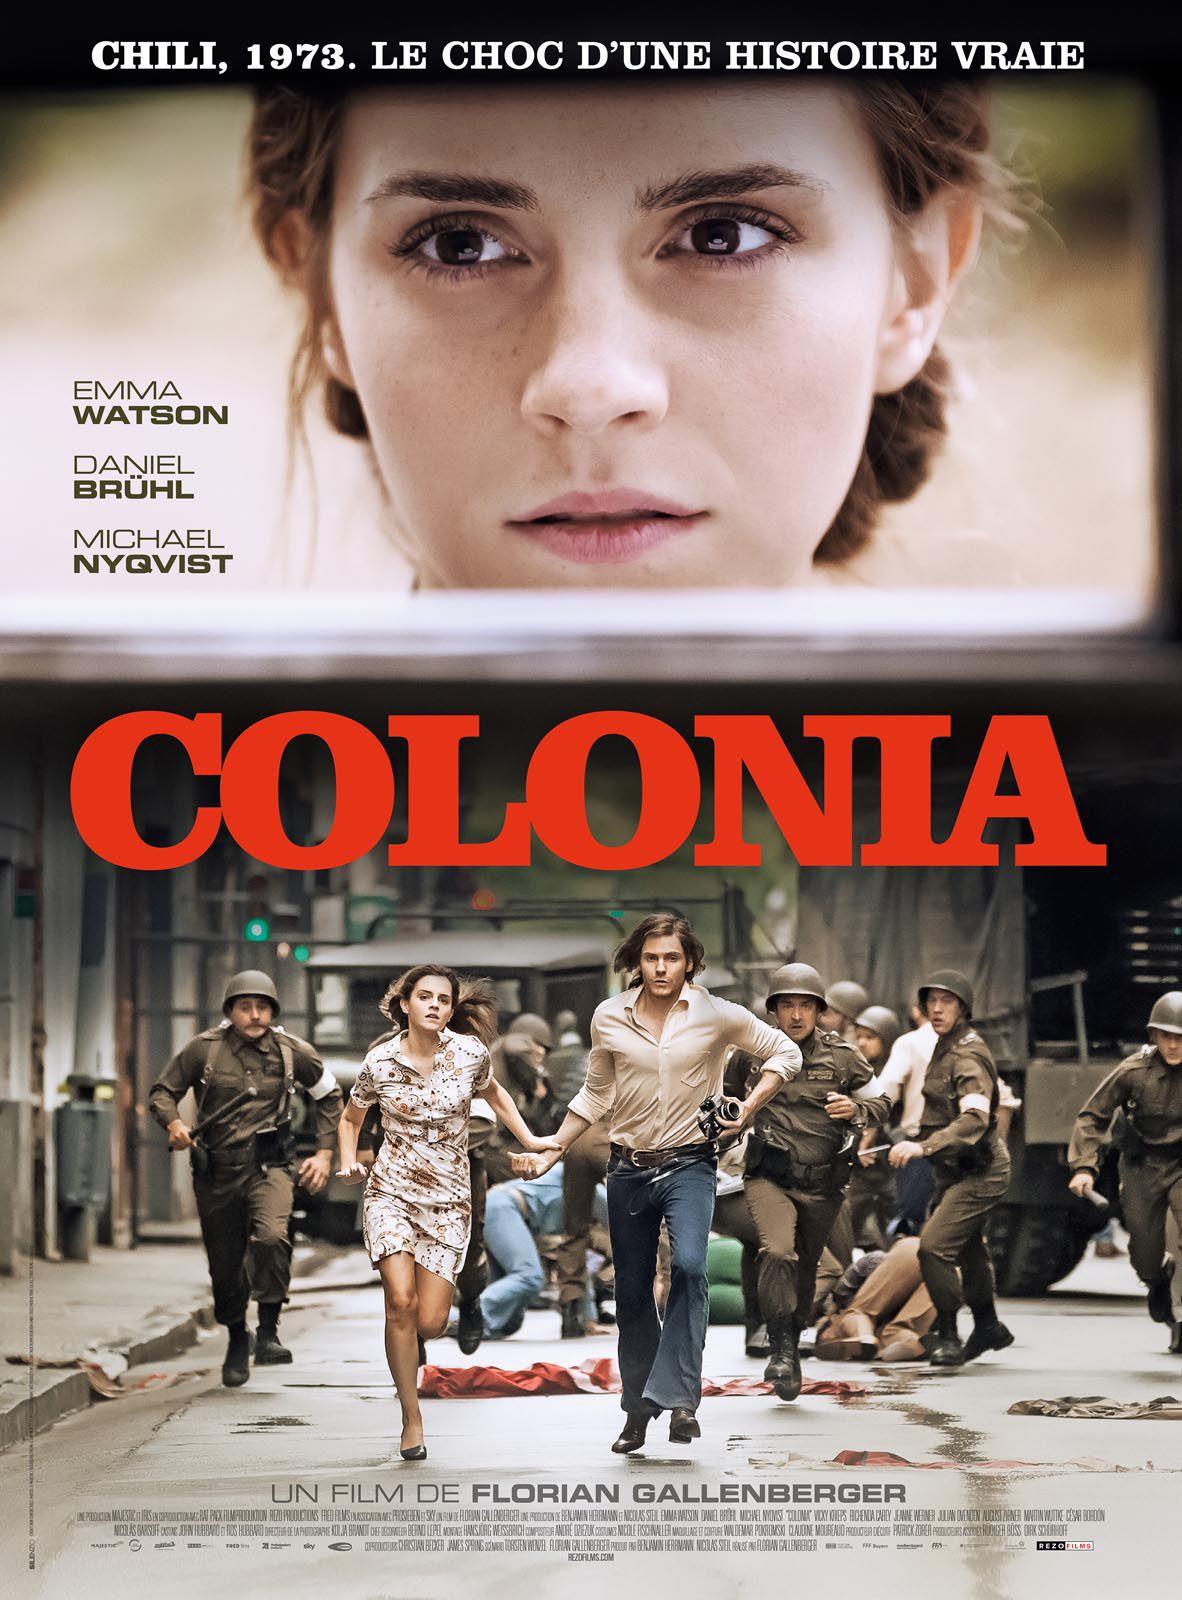 Colonia - Film (2016)